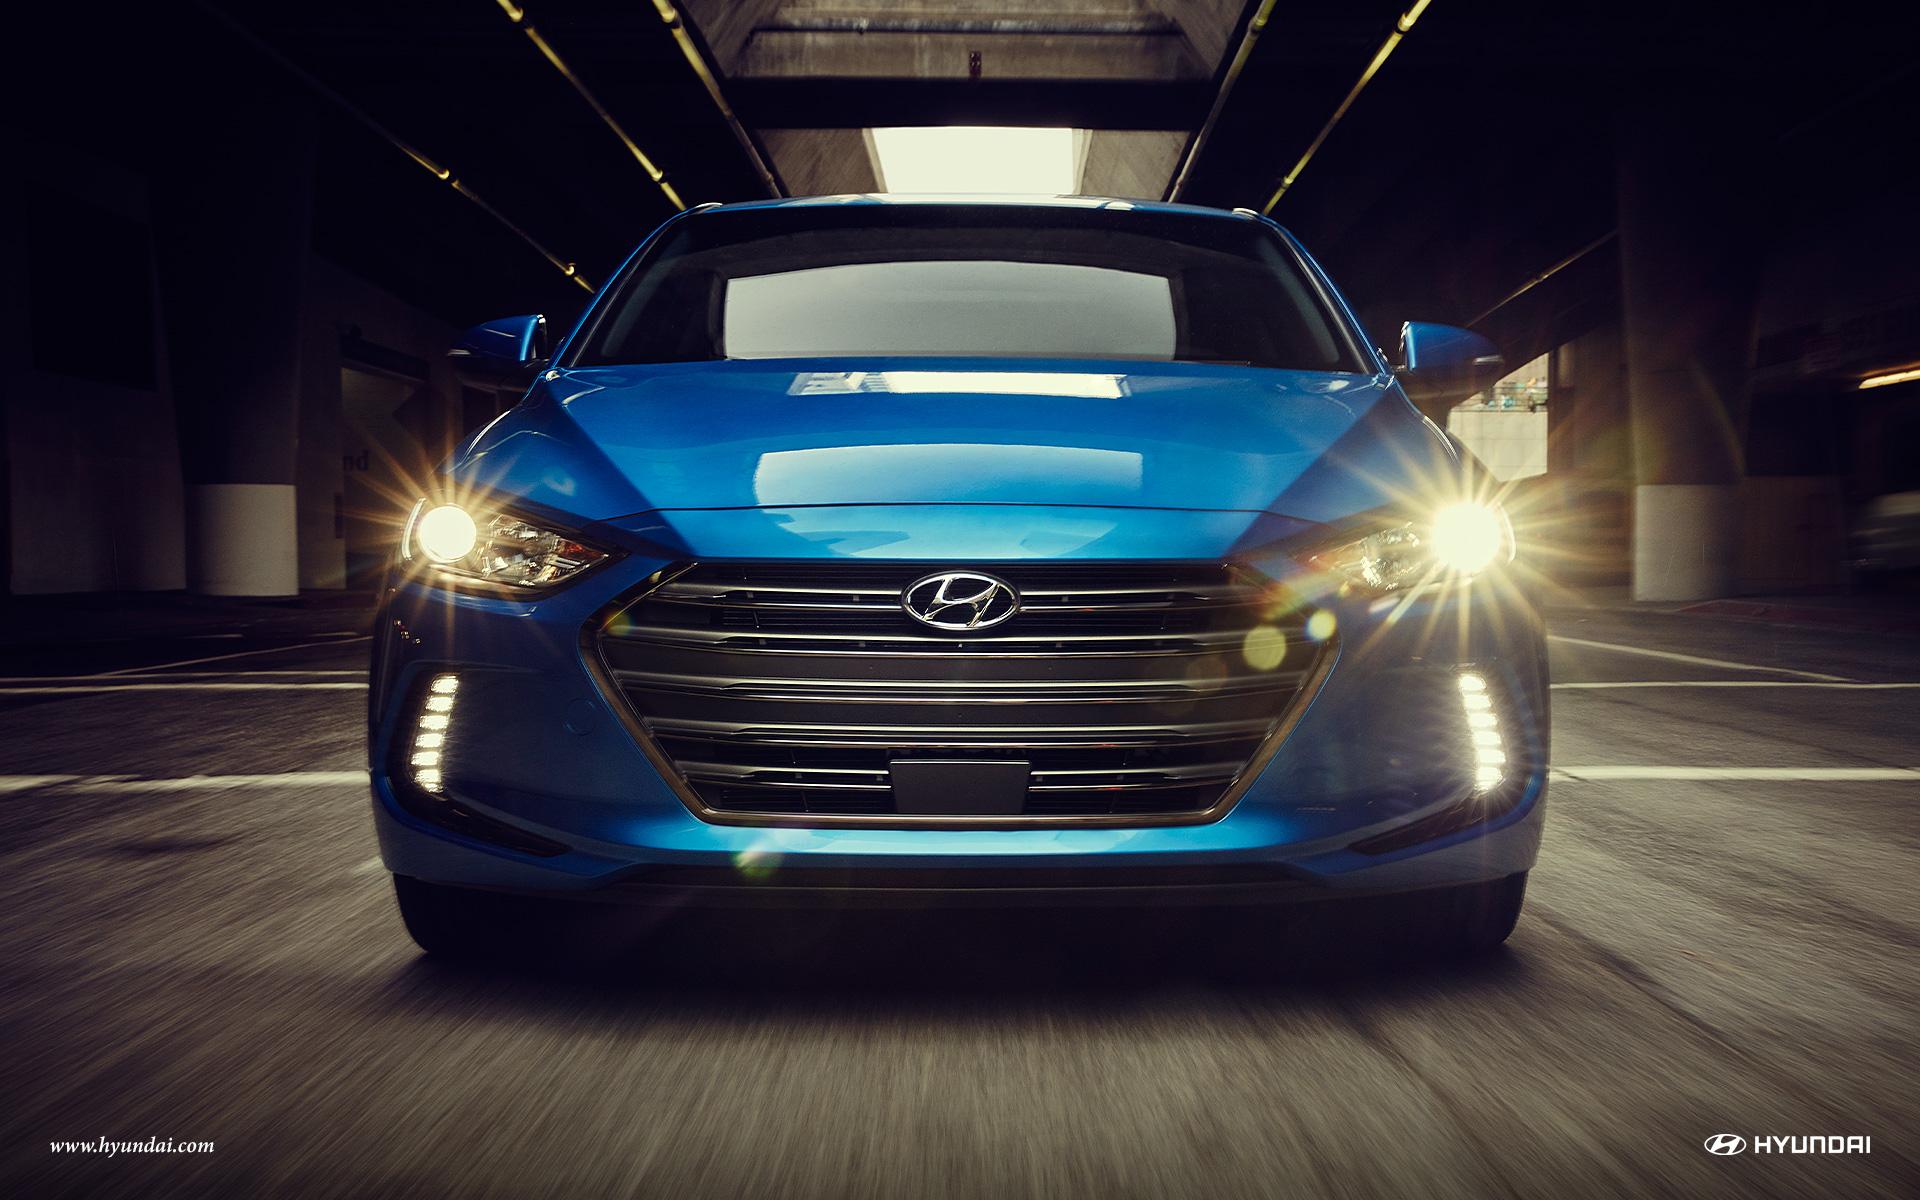 2017 Hyundai Elantra Front View